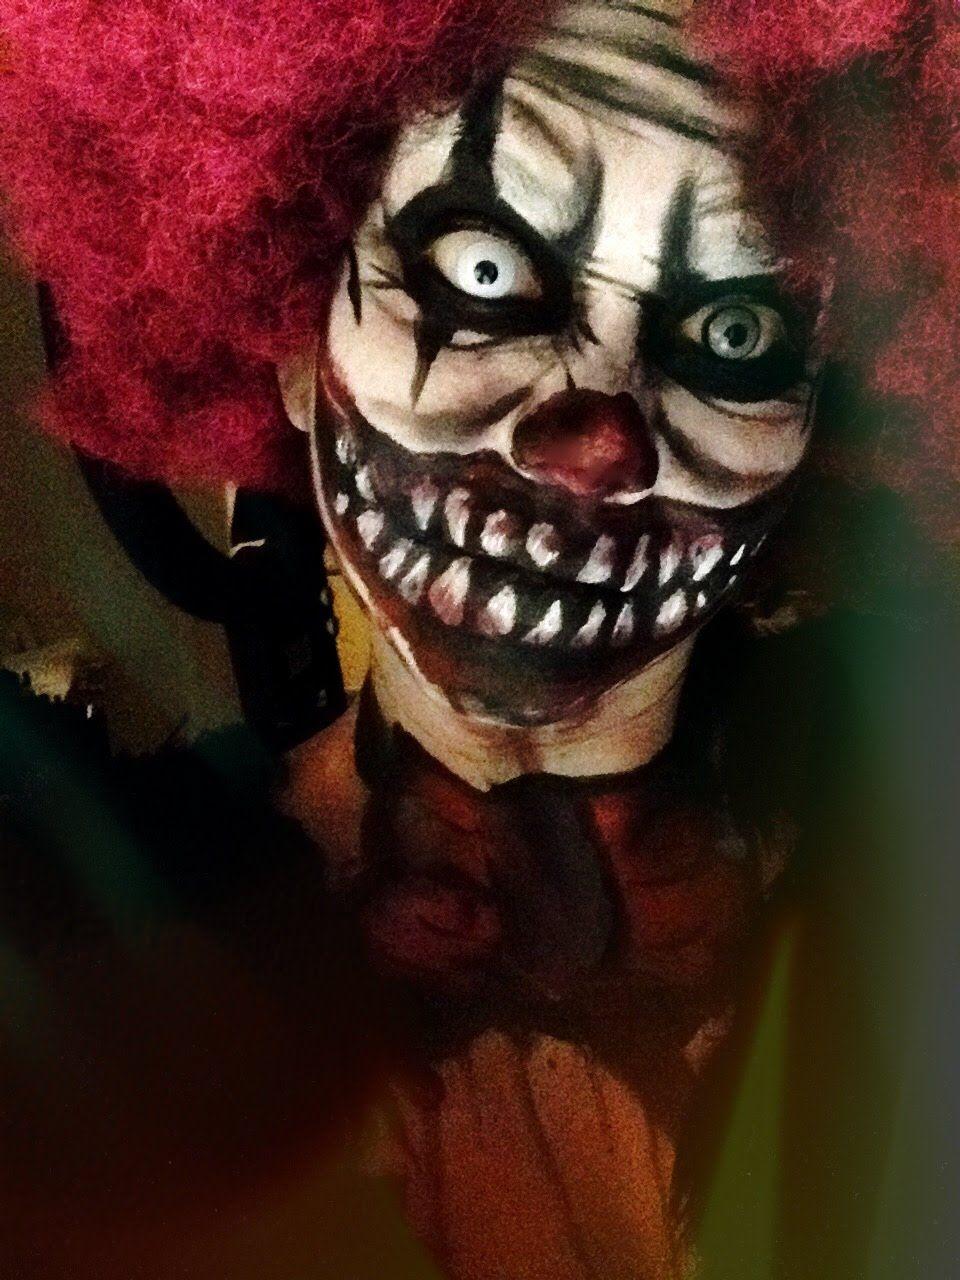 scary clown halloween makeup tutorial halloween costumes pinterest scary clowns halloween. Black Bedroom Furniture Sets. Home Design Ideas